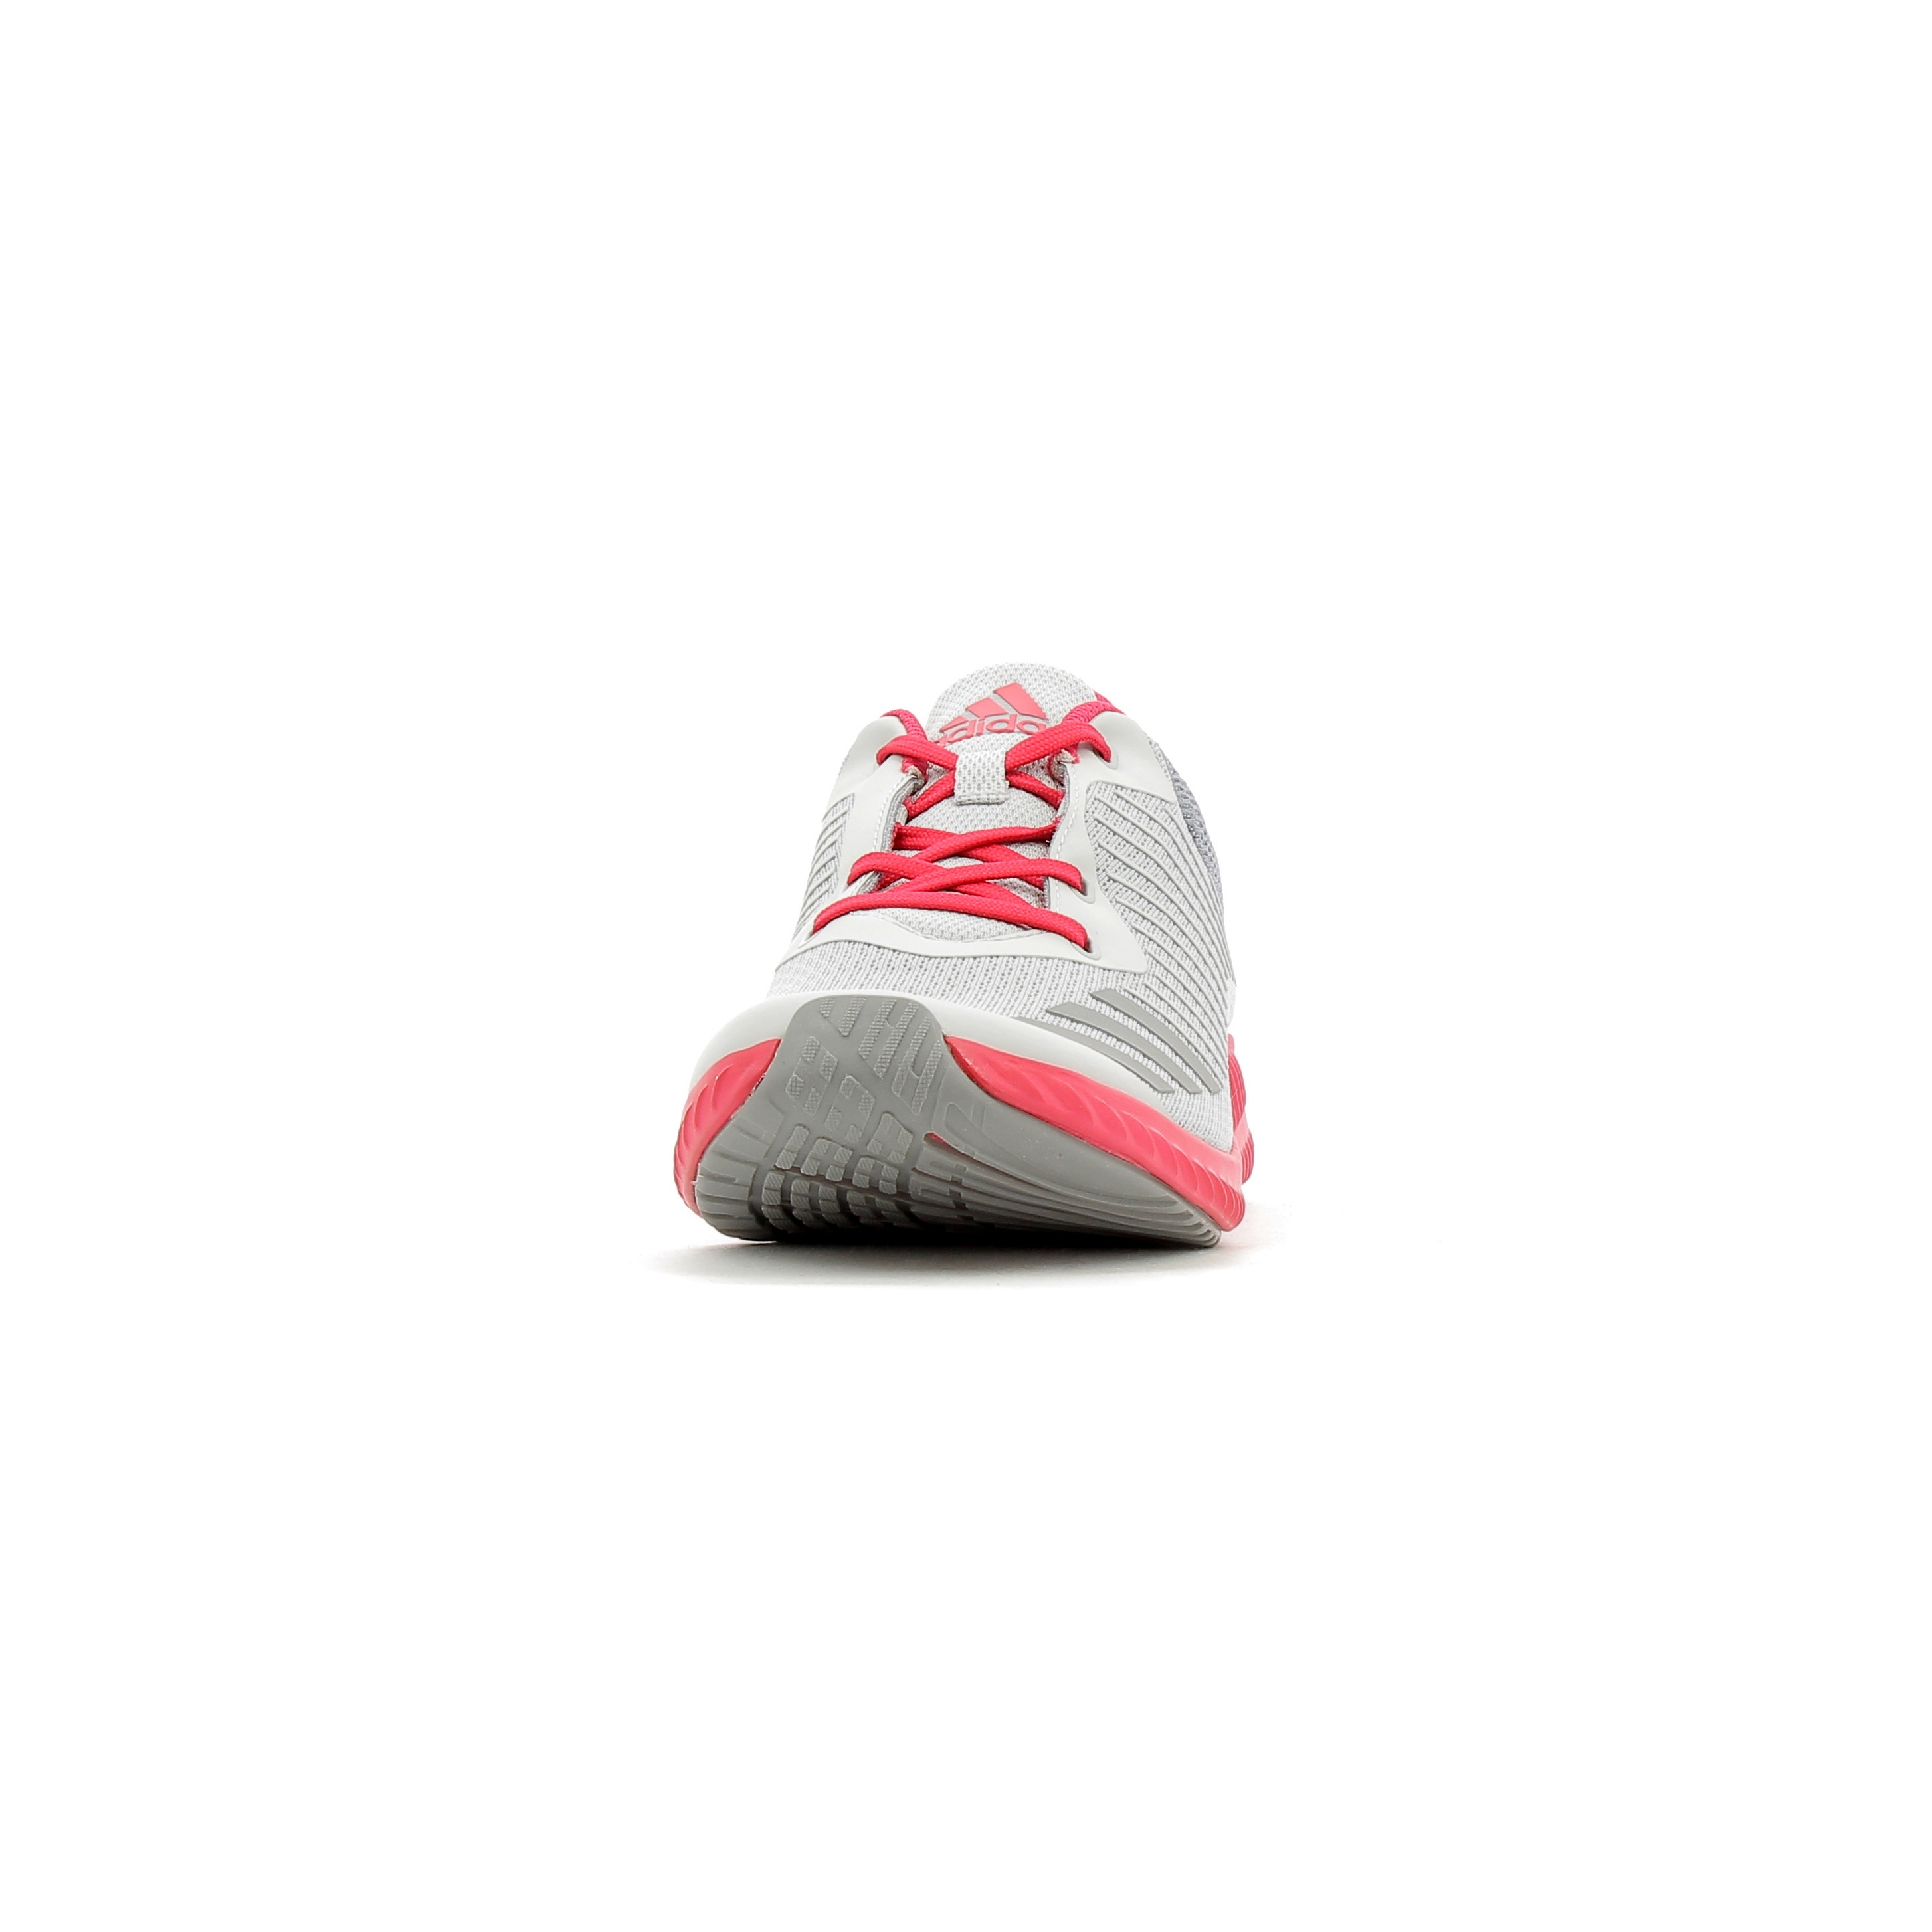 Chaussures de running Adidas Performance FortaRun K enfant